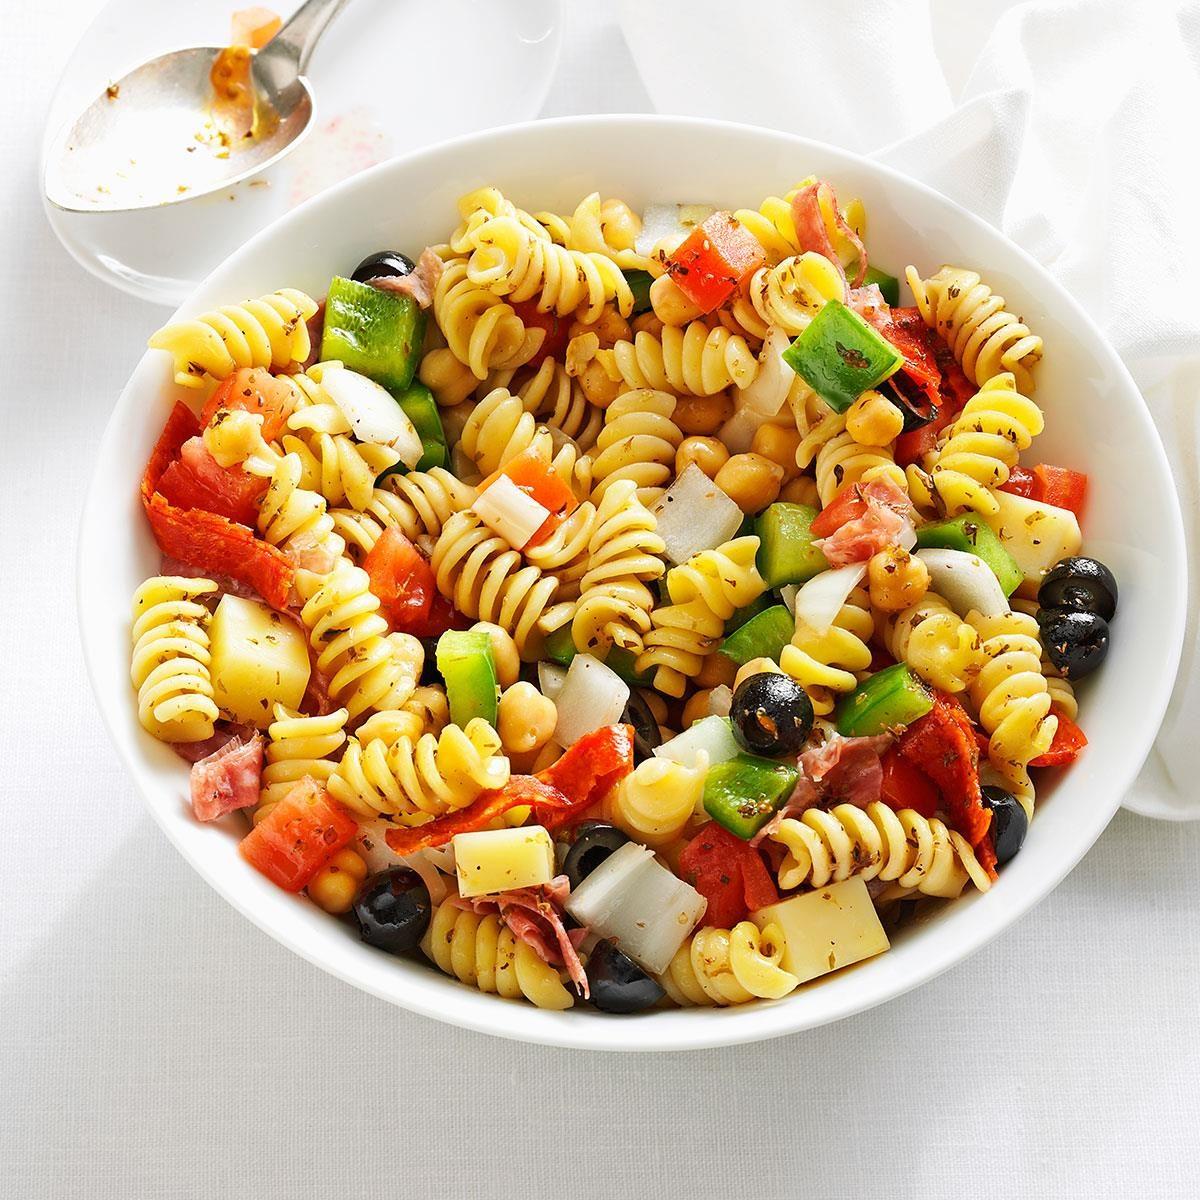 New Hampshire: Homemade Antipasto Salad